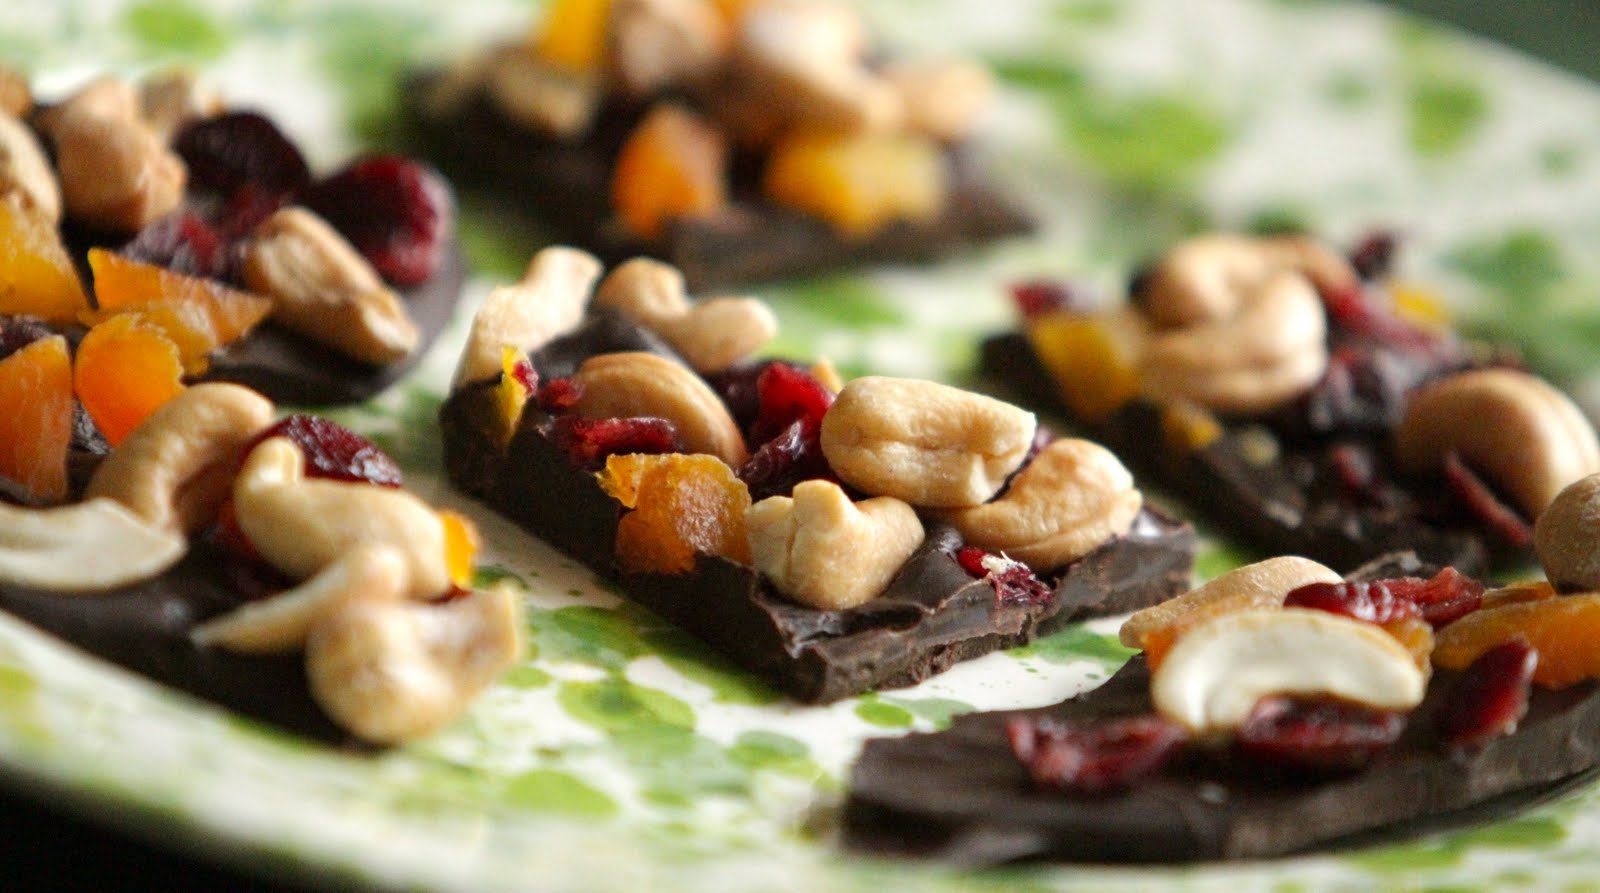 Smith 39 s vegan kitchen french chocolate bark ina garten - Ina garten french recipes ...